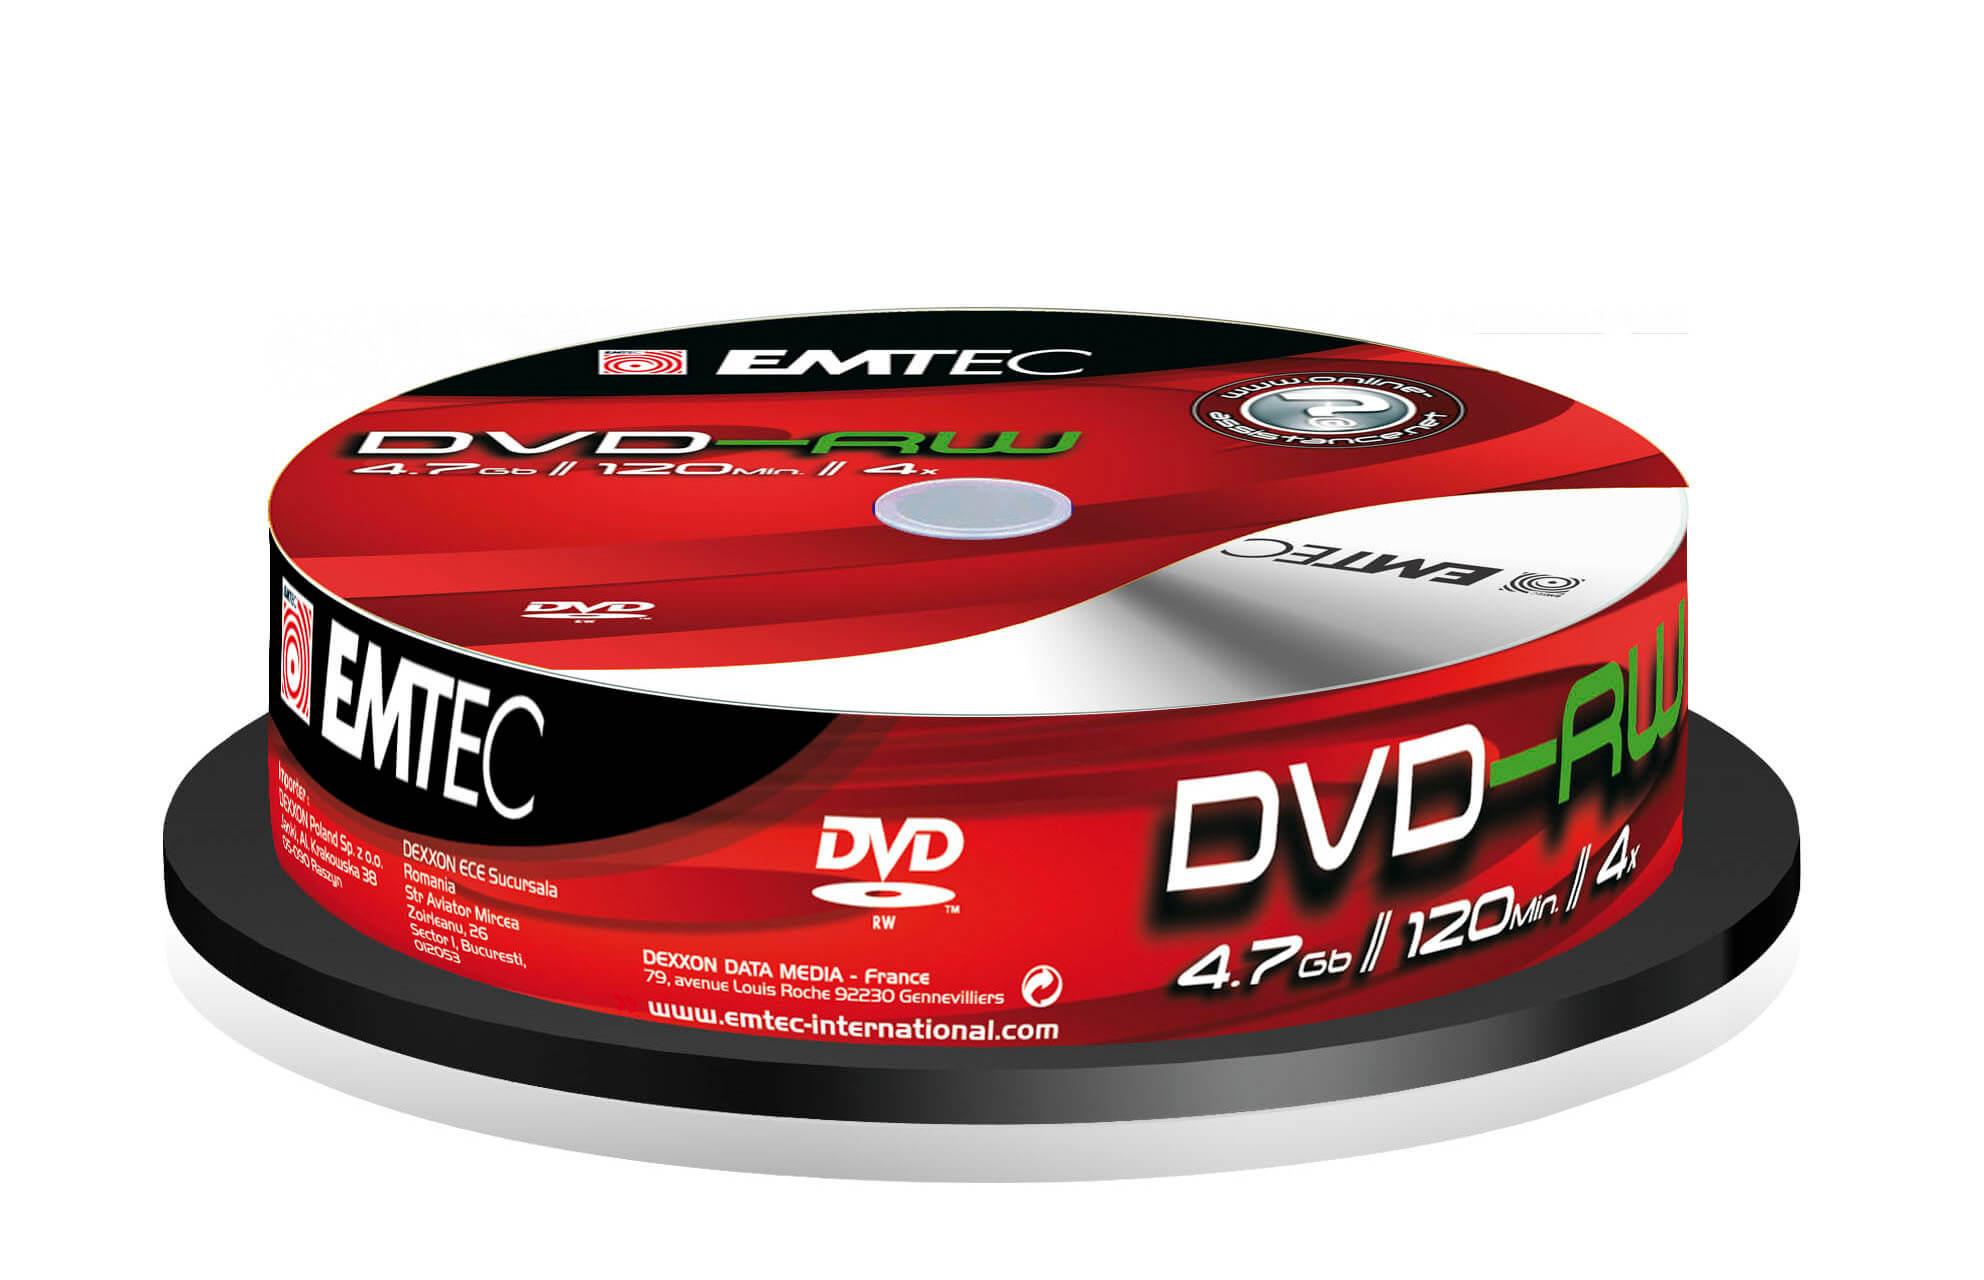 Диски Emtec DVD-RW 4.7Gb 4x в упаковке